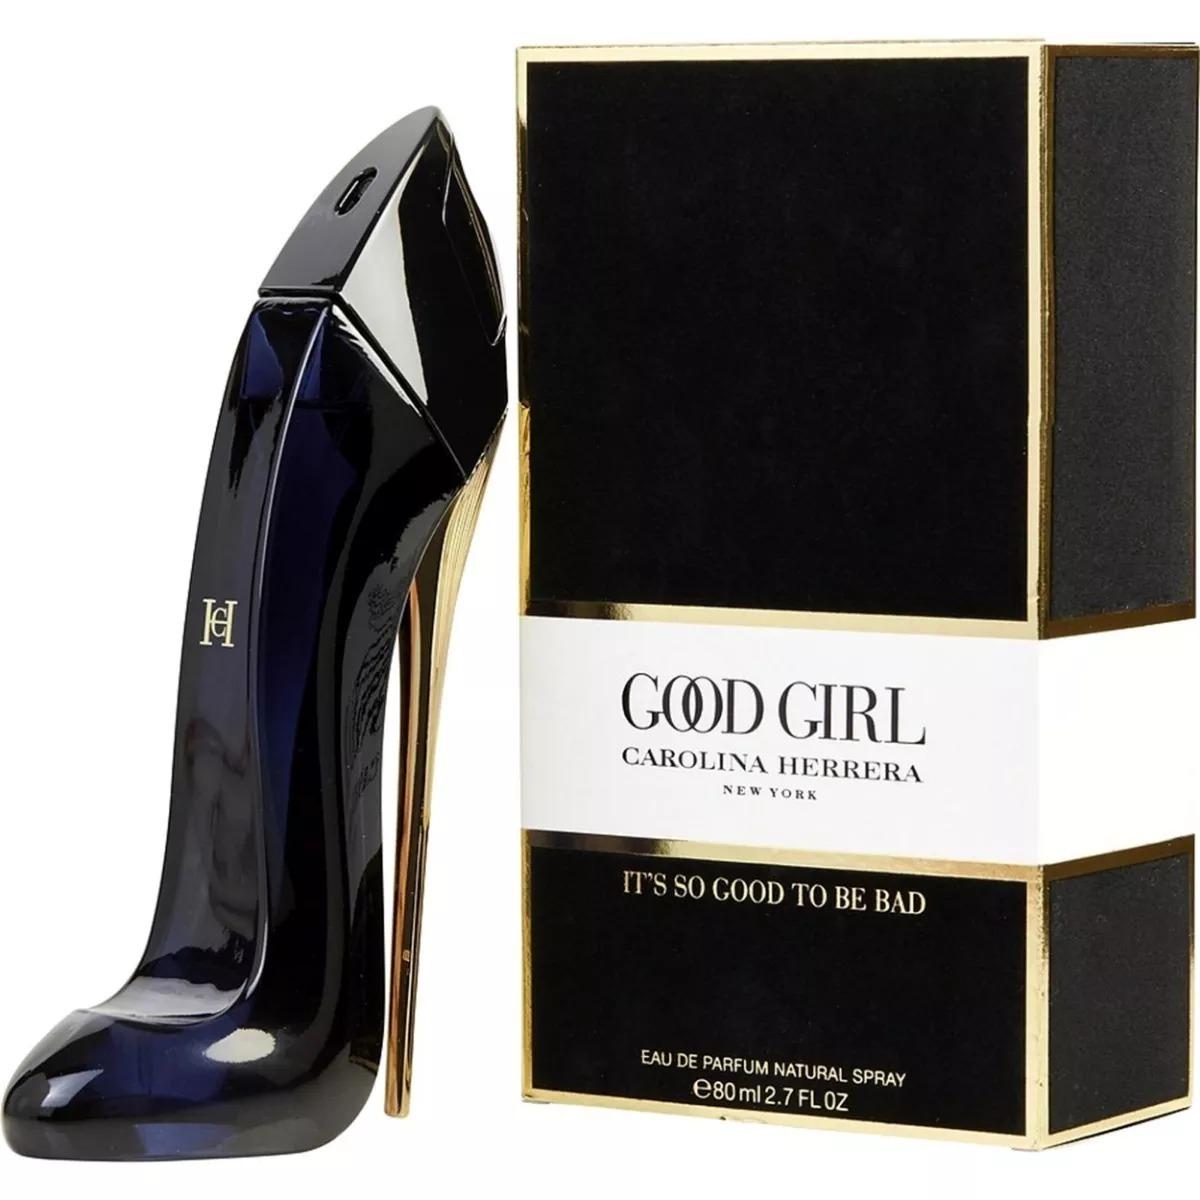 Perfume Good Tacon Mujer Negro Carolina Herrera Dama Ch Girl n0vwN8m